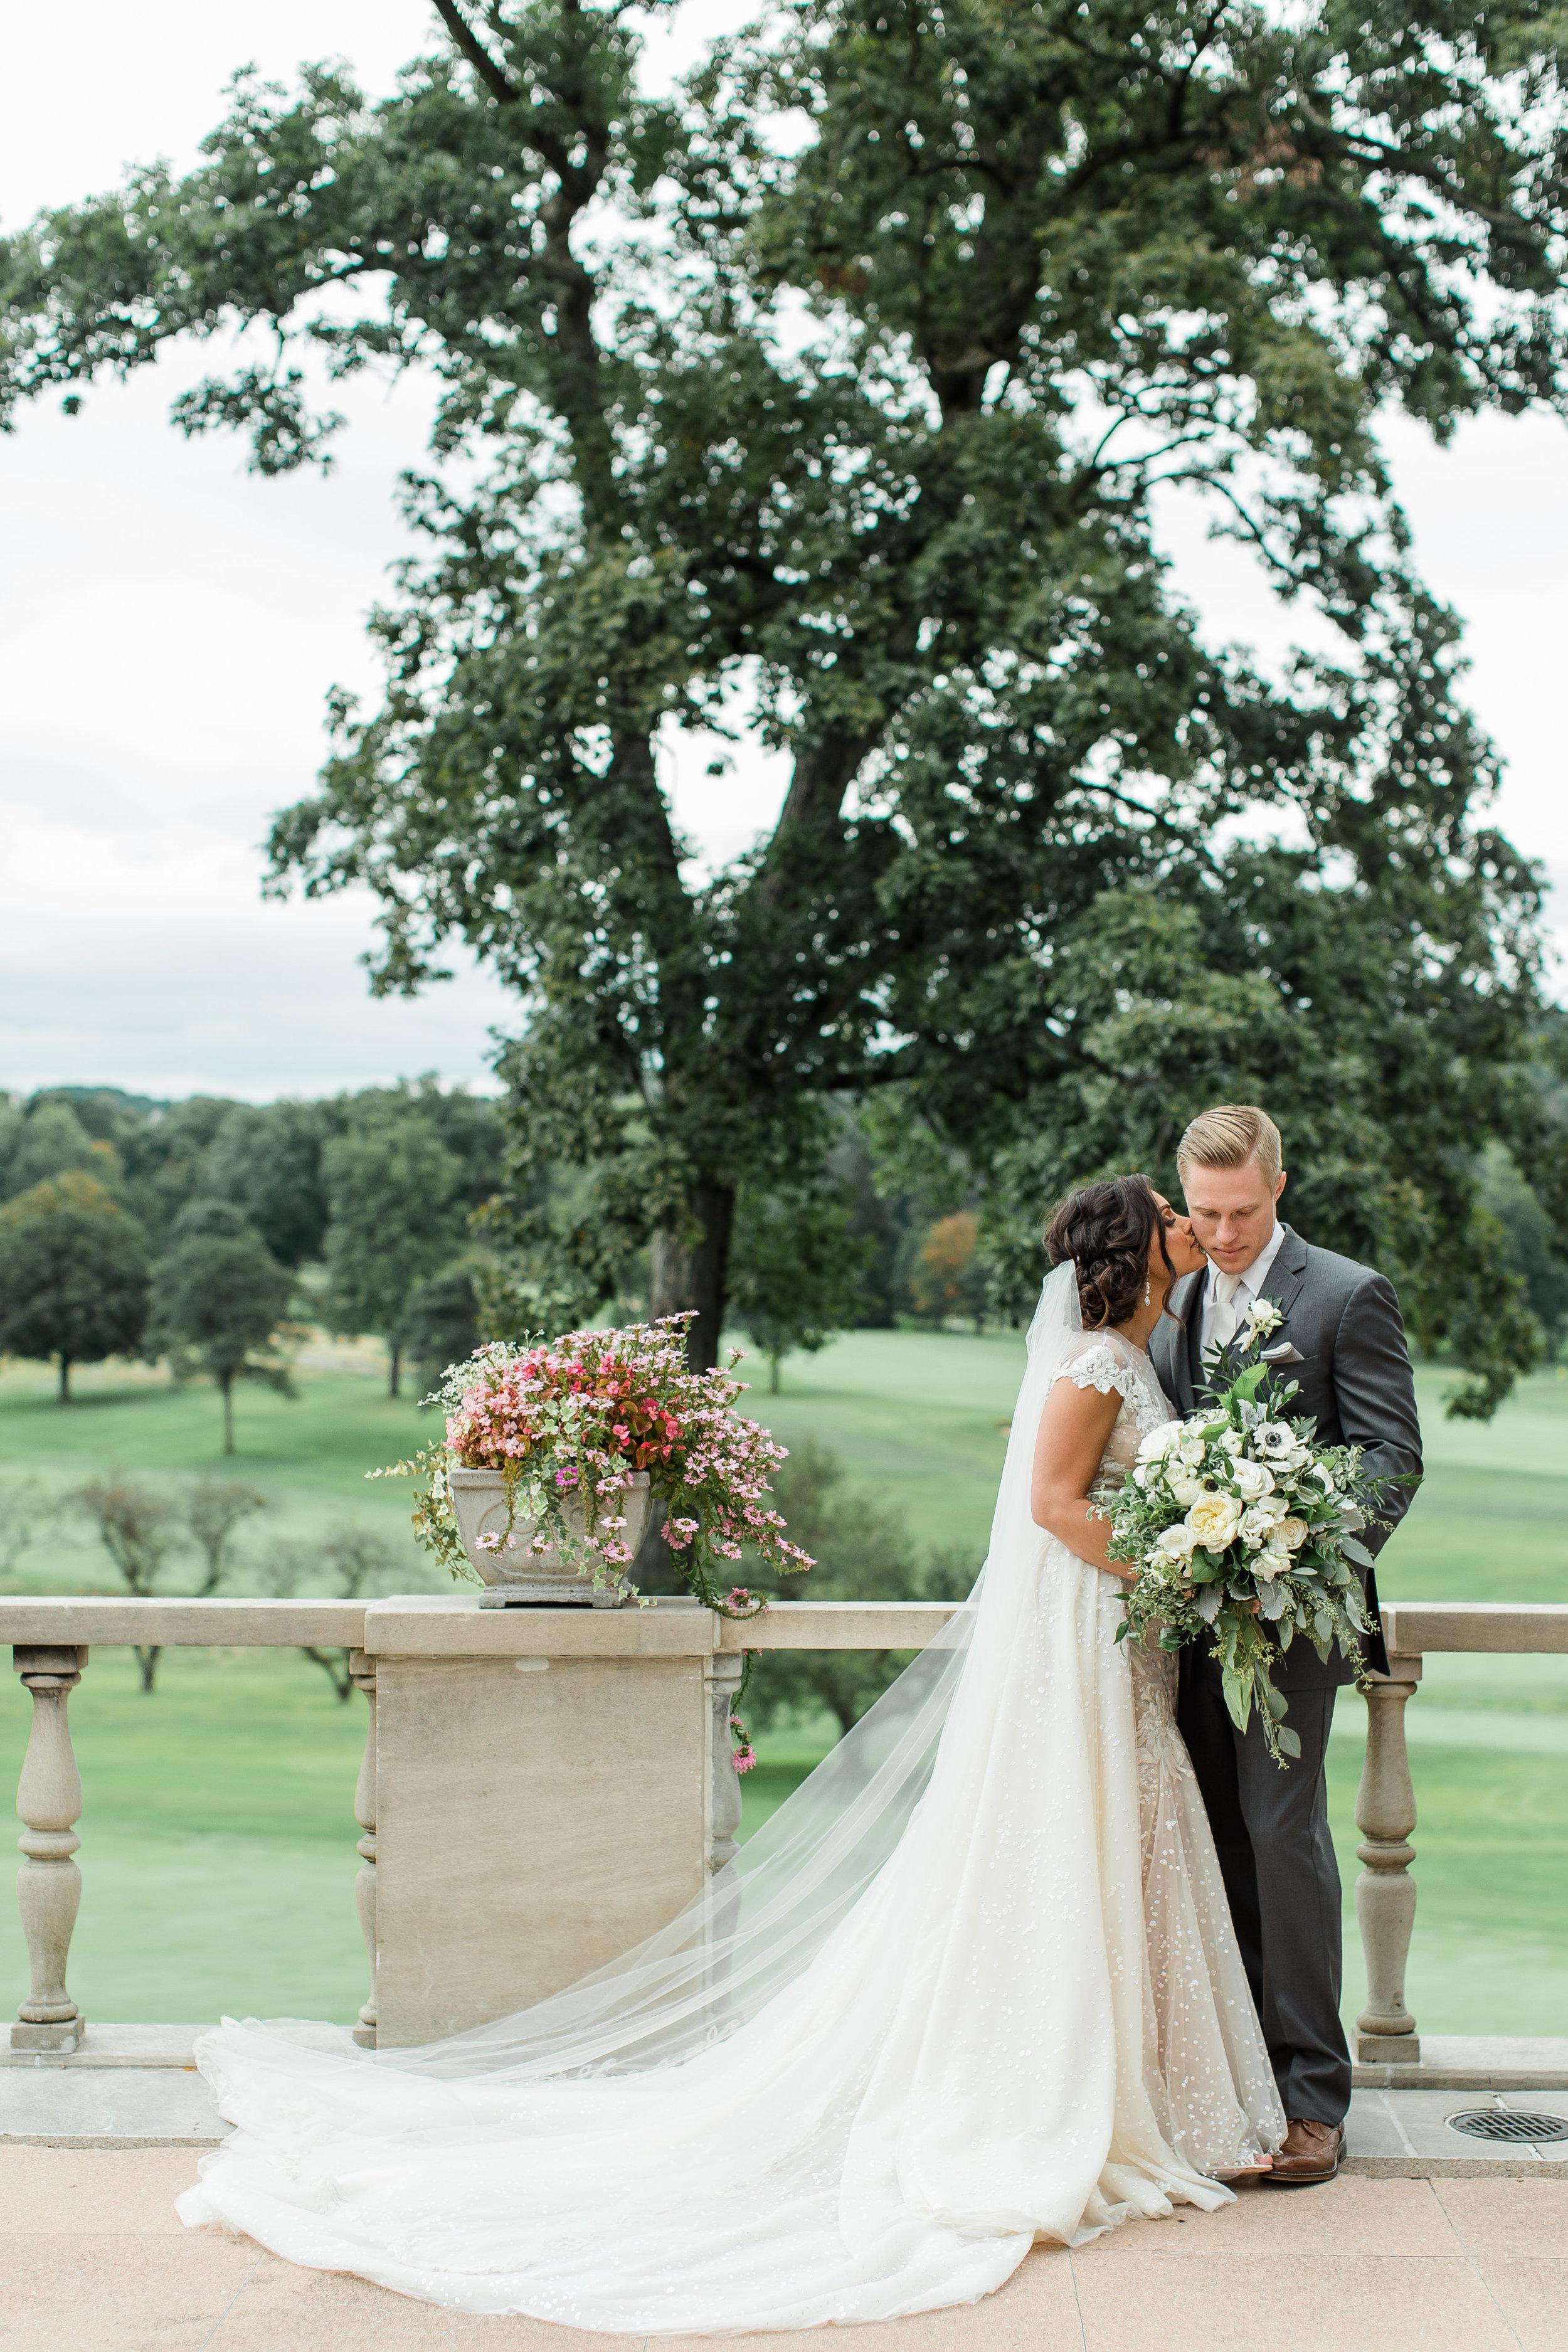 pittsburgh-wedding-photographer-classic-greenery-foxchapelgolfclub0023.jpg